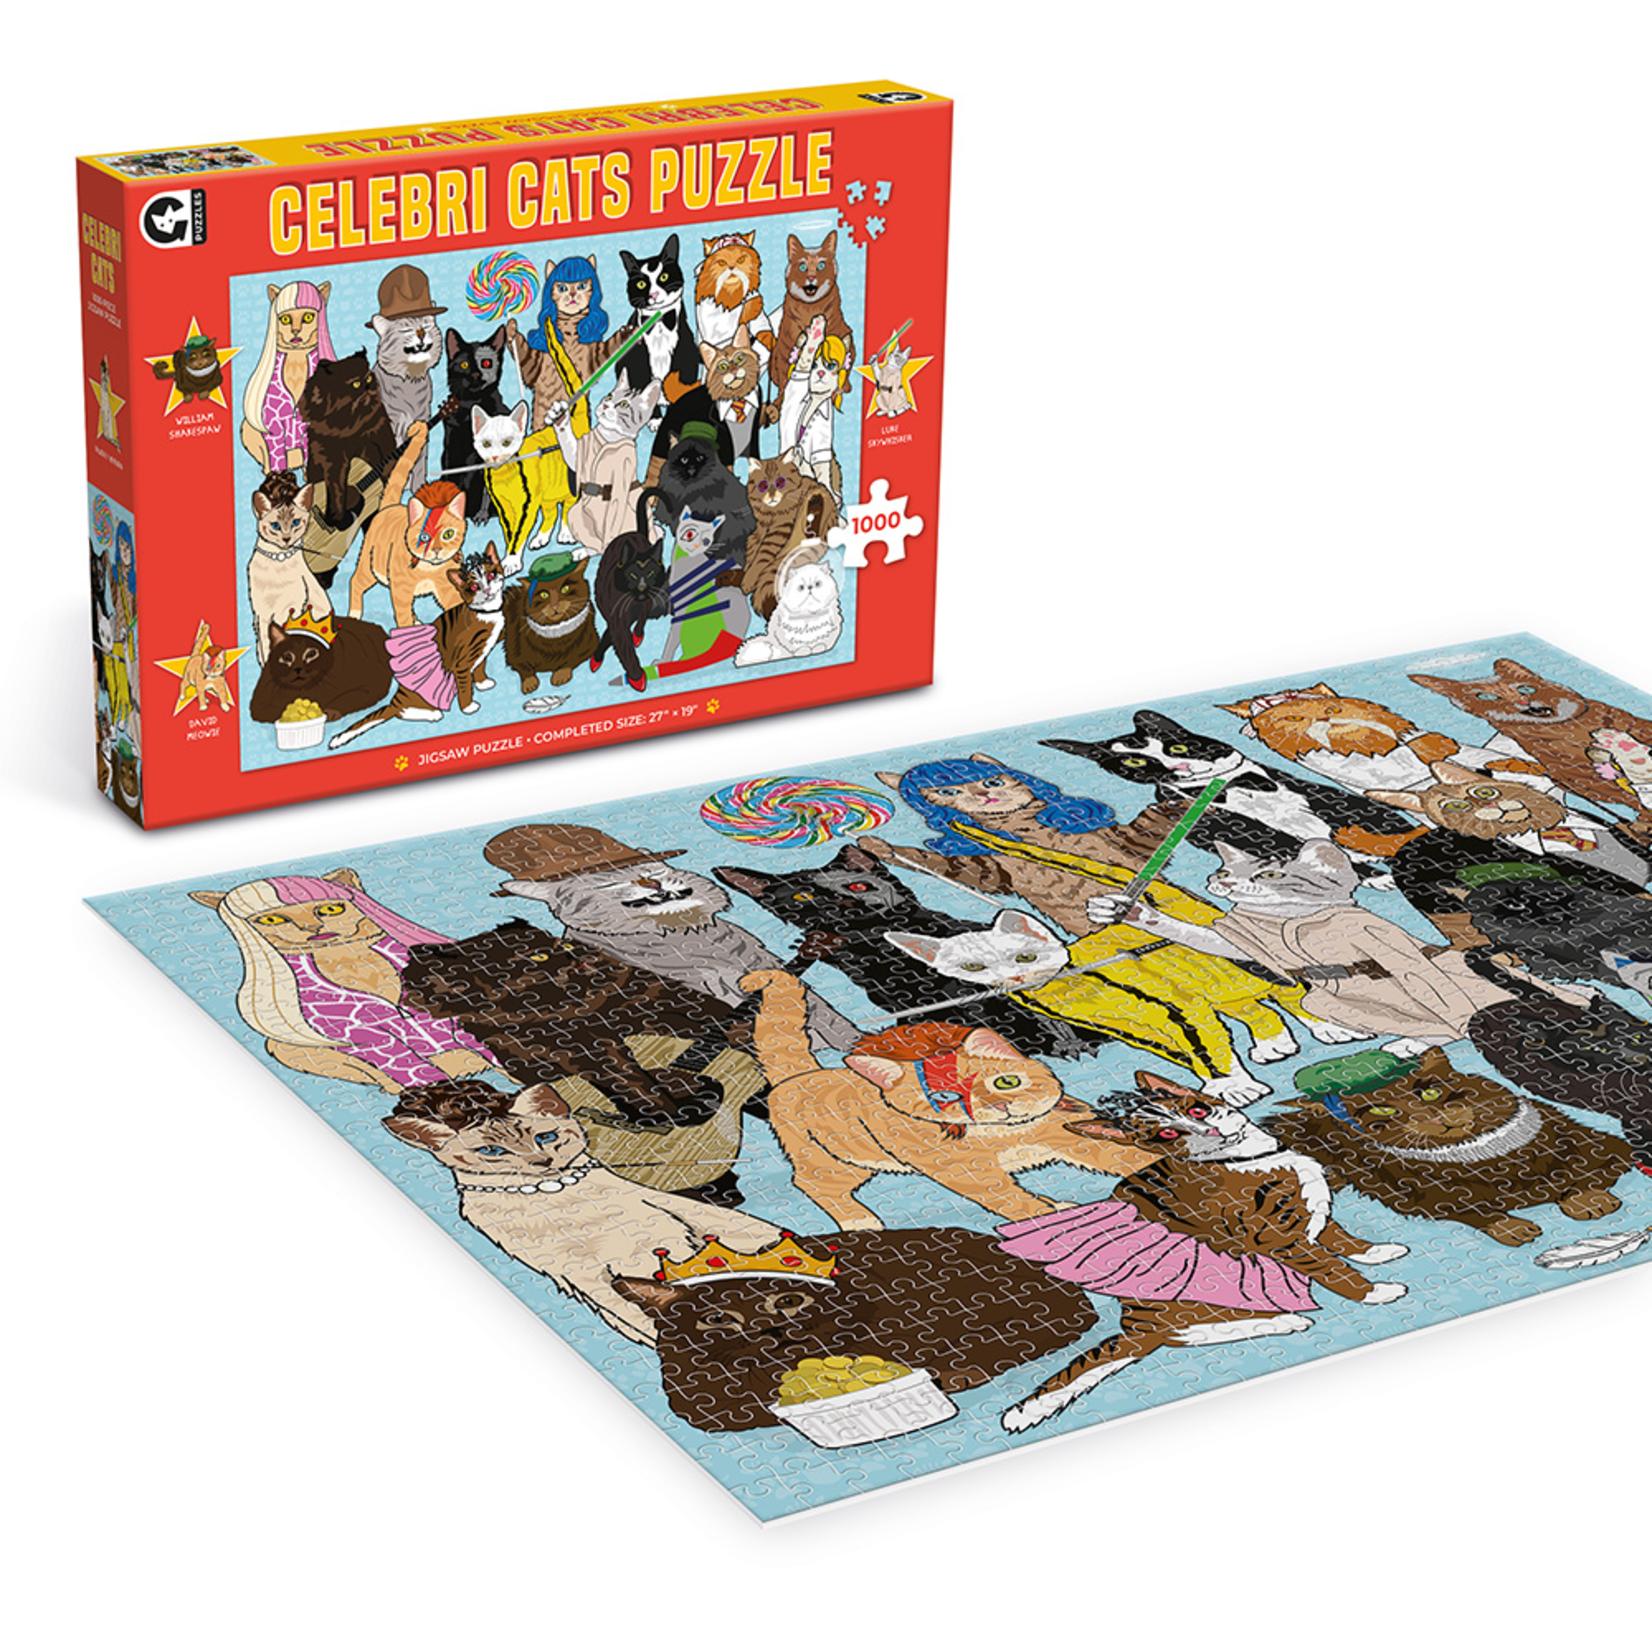 Ginger Fox Celebri Cats Puzzle (1000 pieces)